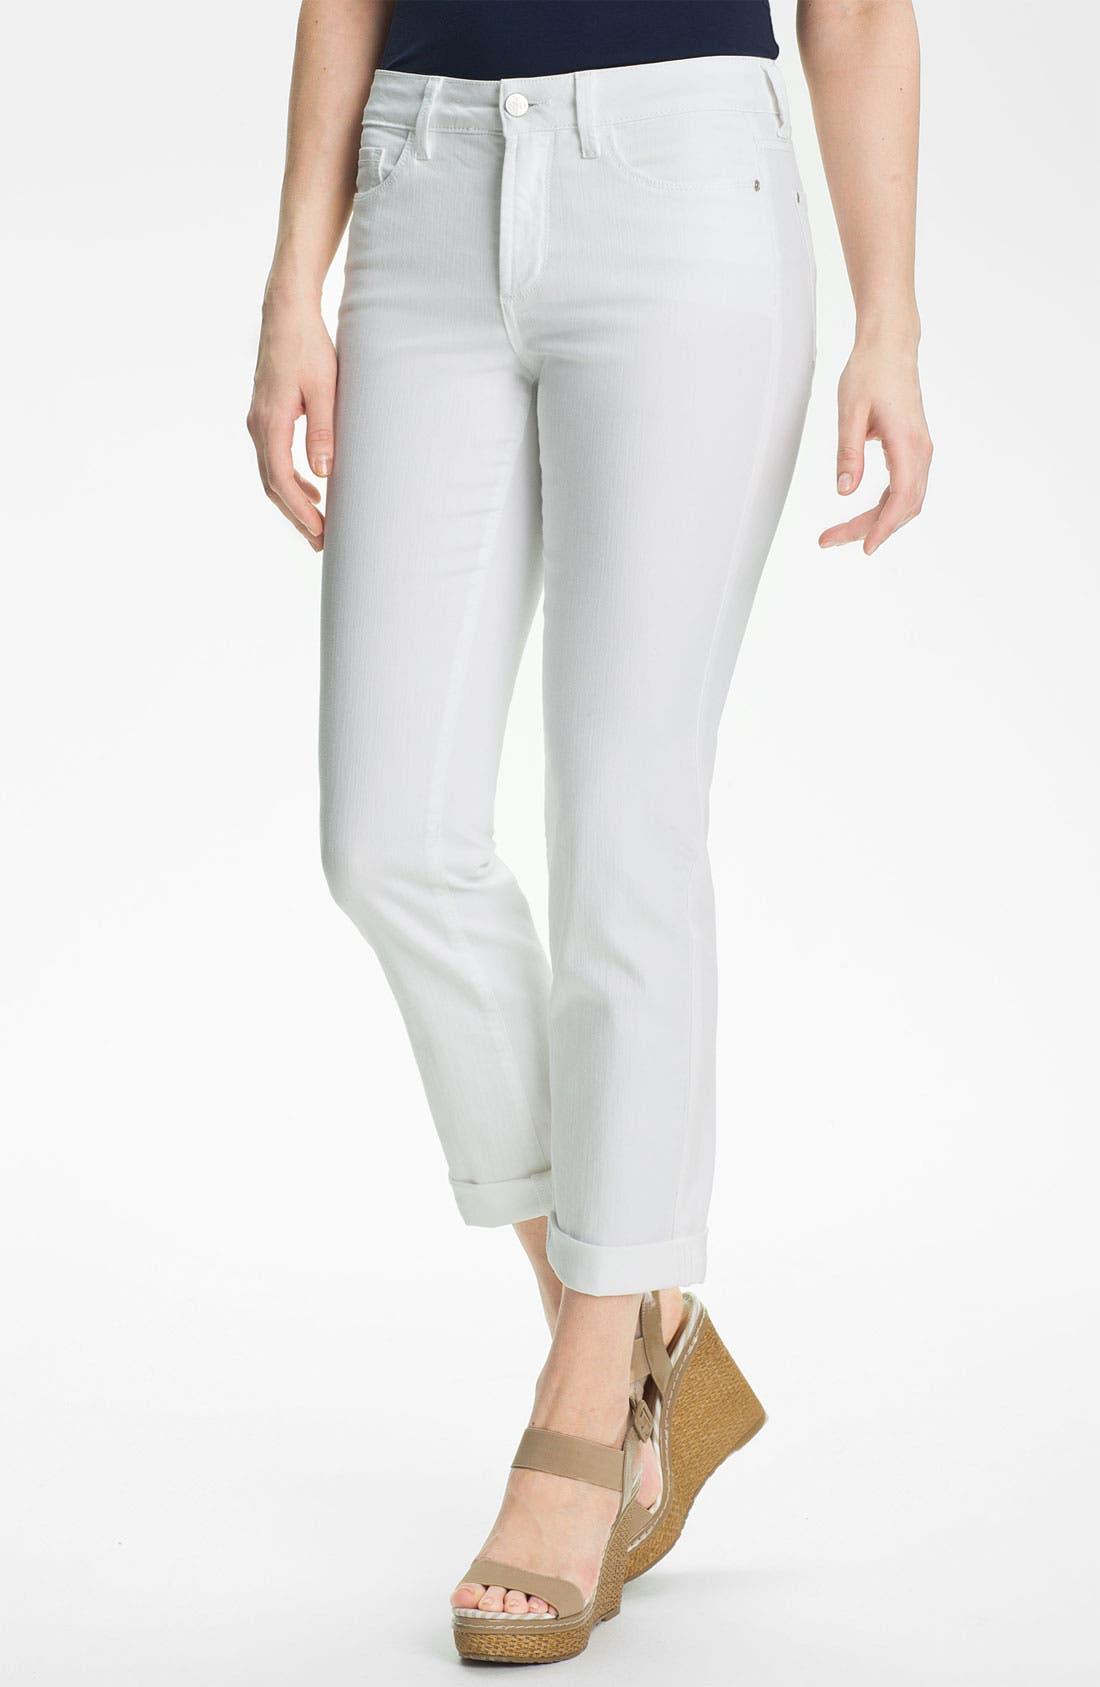 Main Image - NYDJ 'Tanya' Stretch Boyfriend Jeans